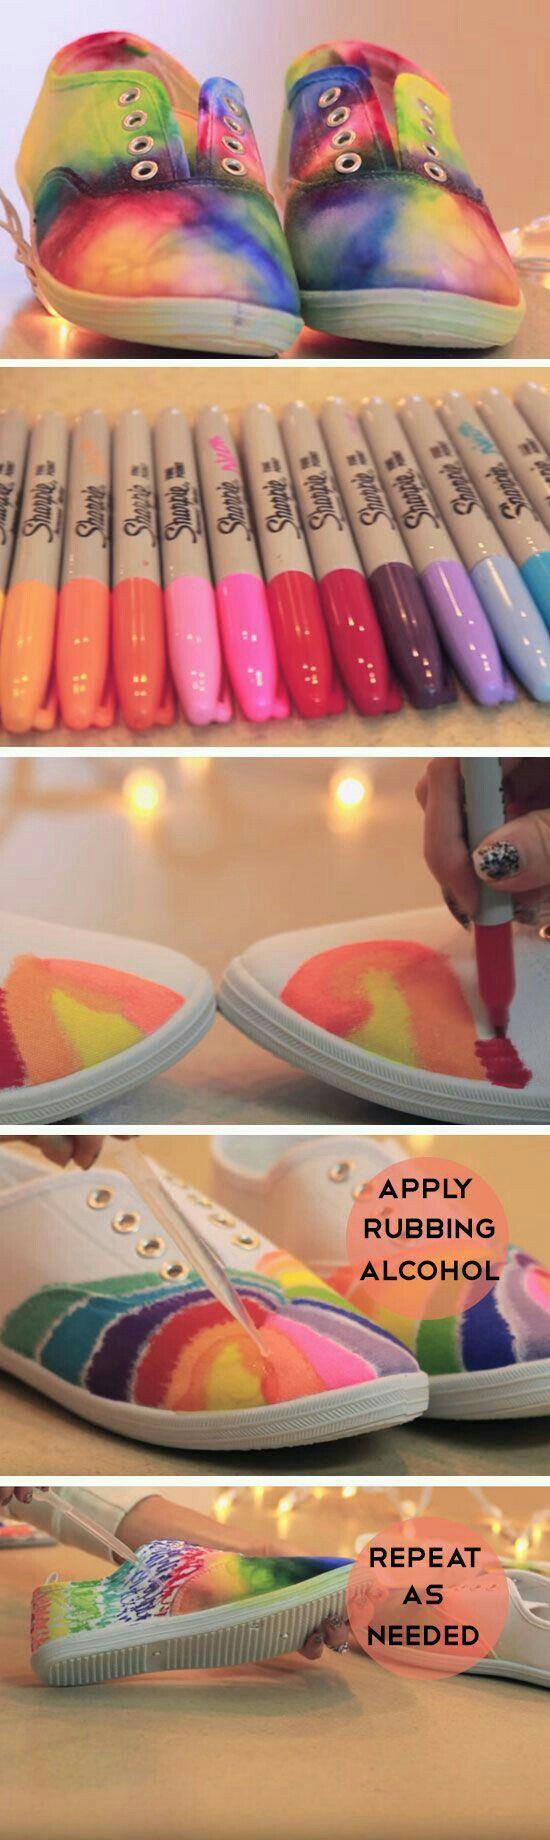 Love love love this idea! Wanna do it some day.